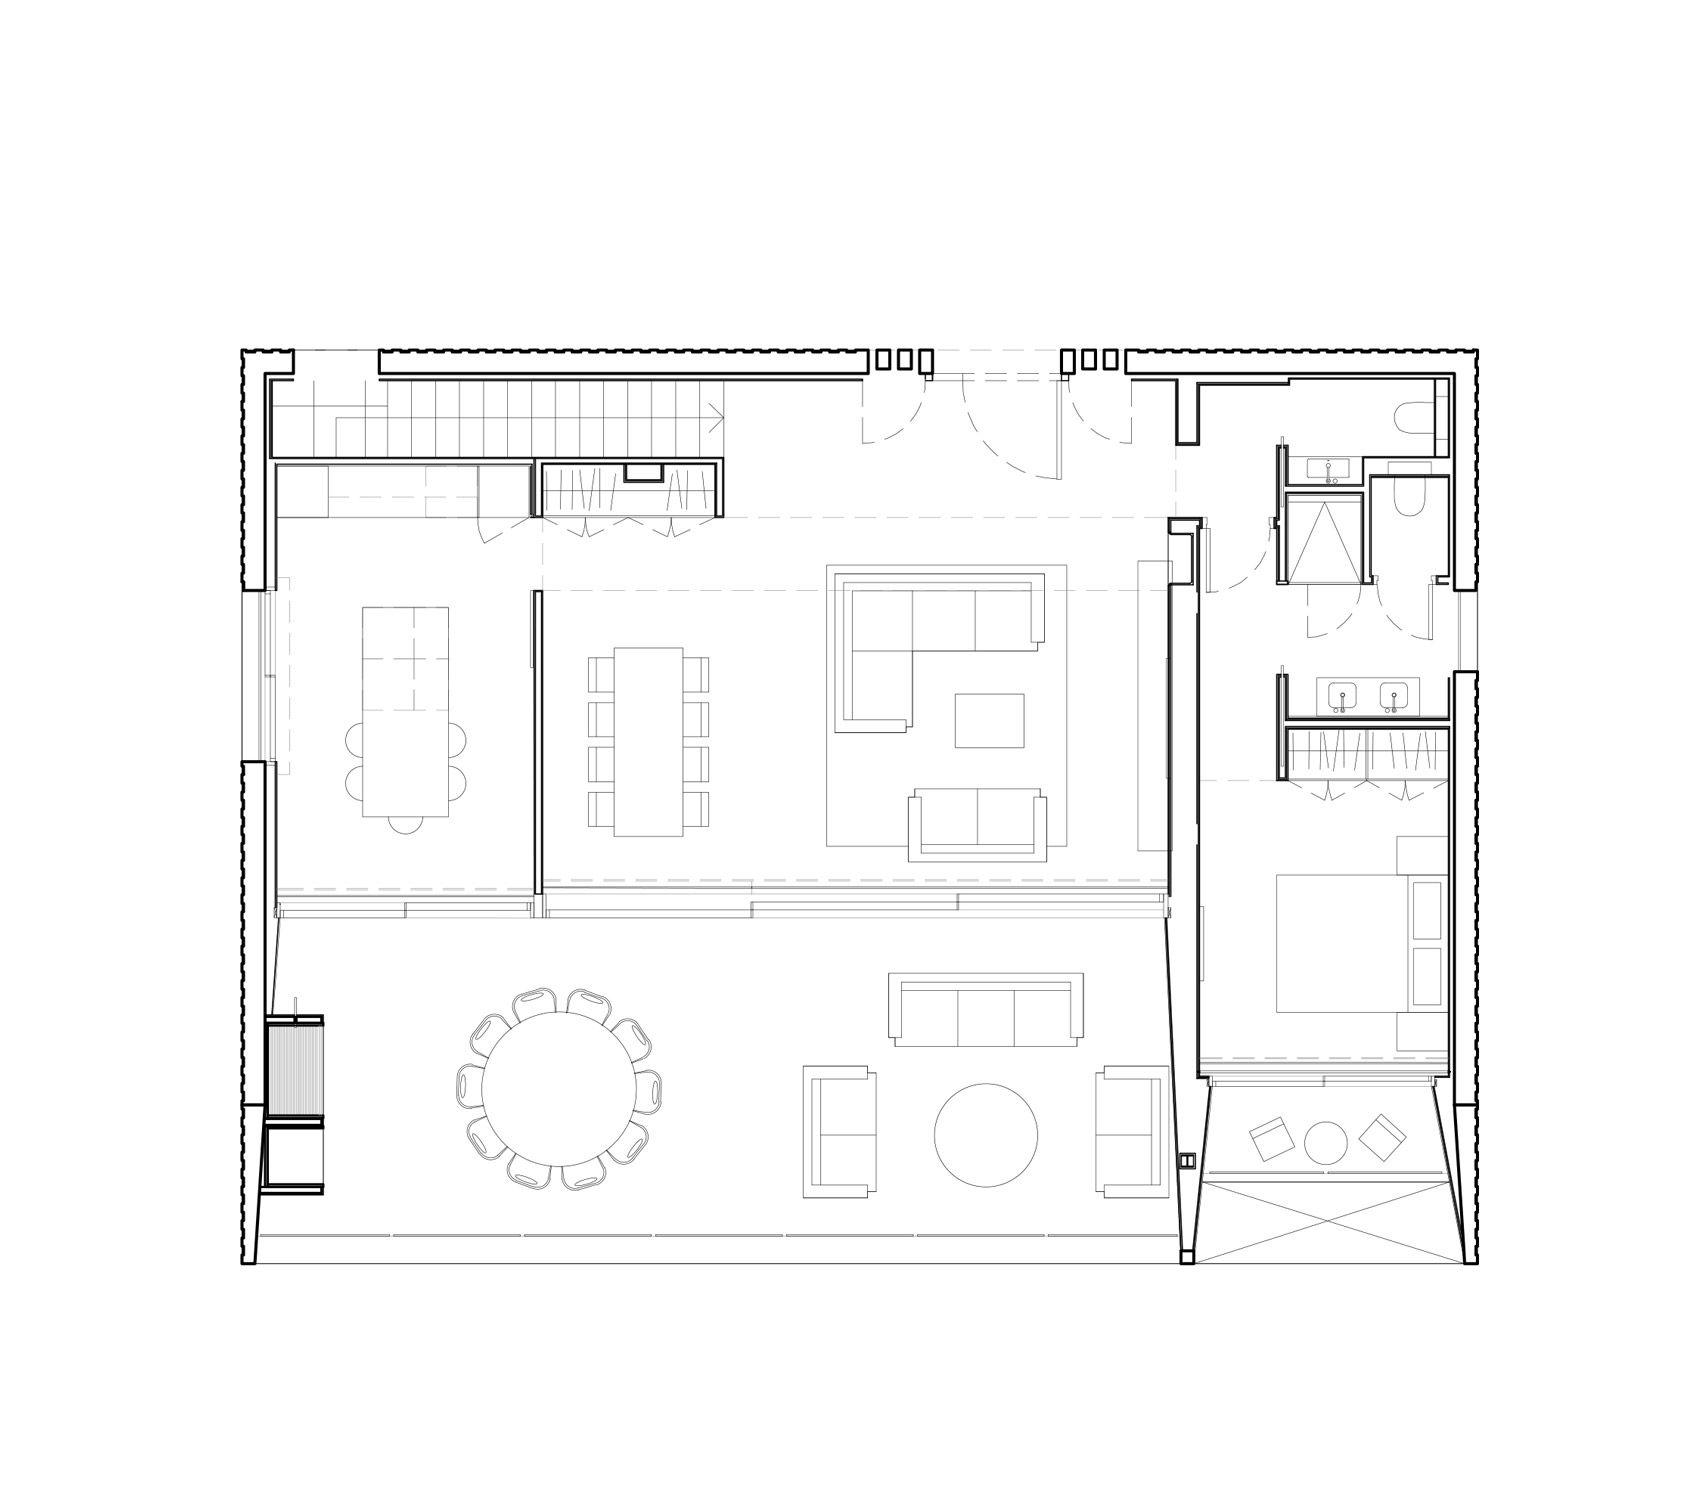 Nomo Studio Designs Concrete House On Menorca To Frame Sea Views Concrete House Concrete Design Concrete